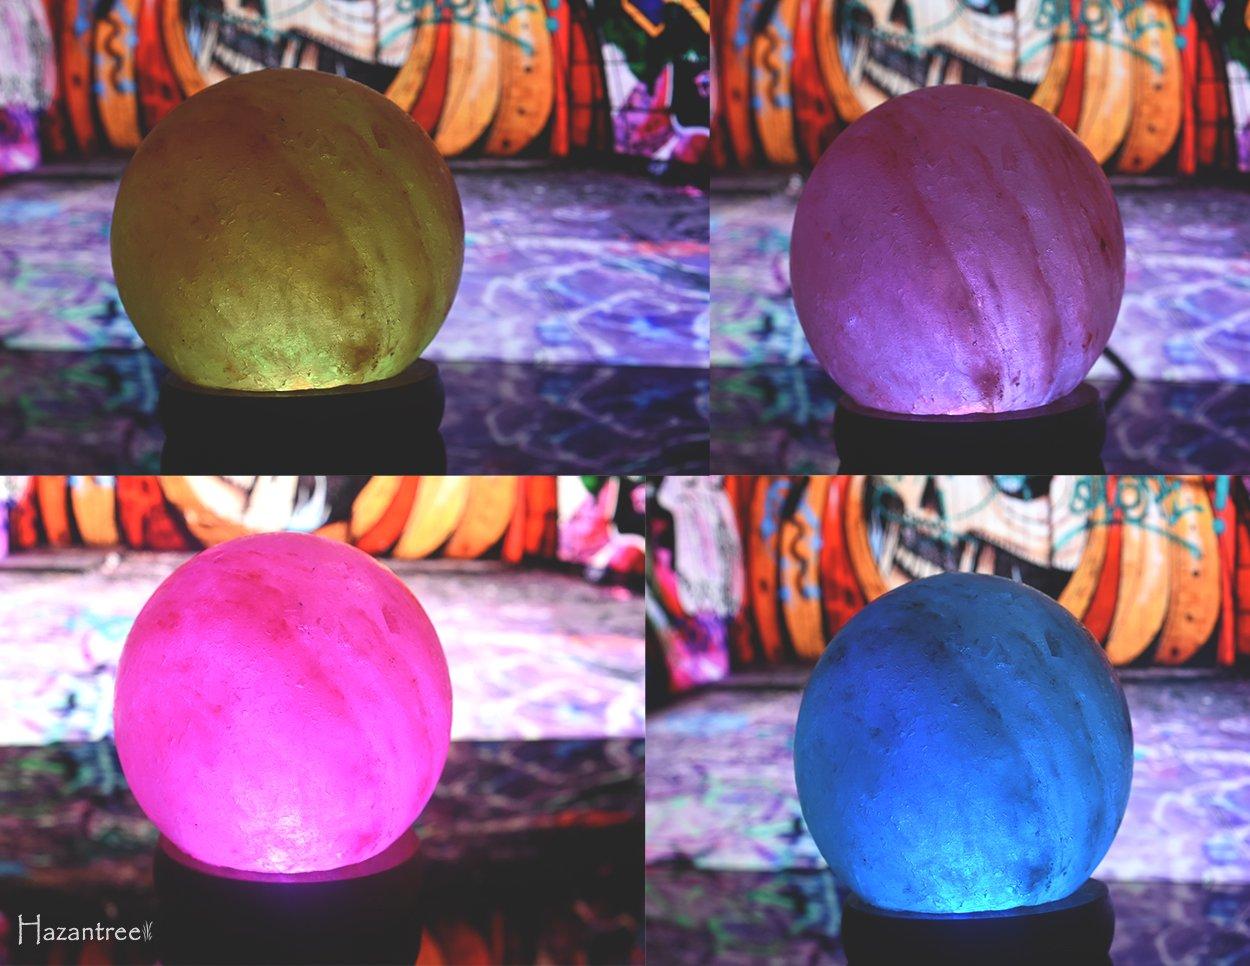 Hazantree LED USB 2 Pack Himalayan Salt Lamp with Wood Base Multi Color Changing Globe